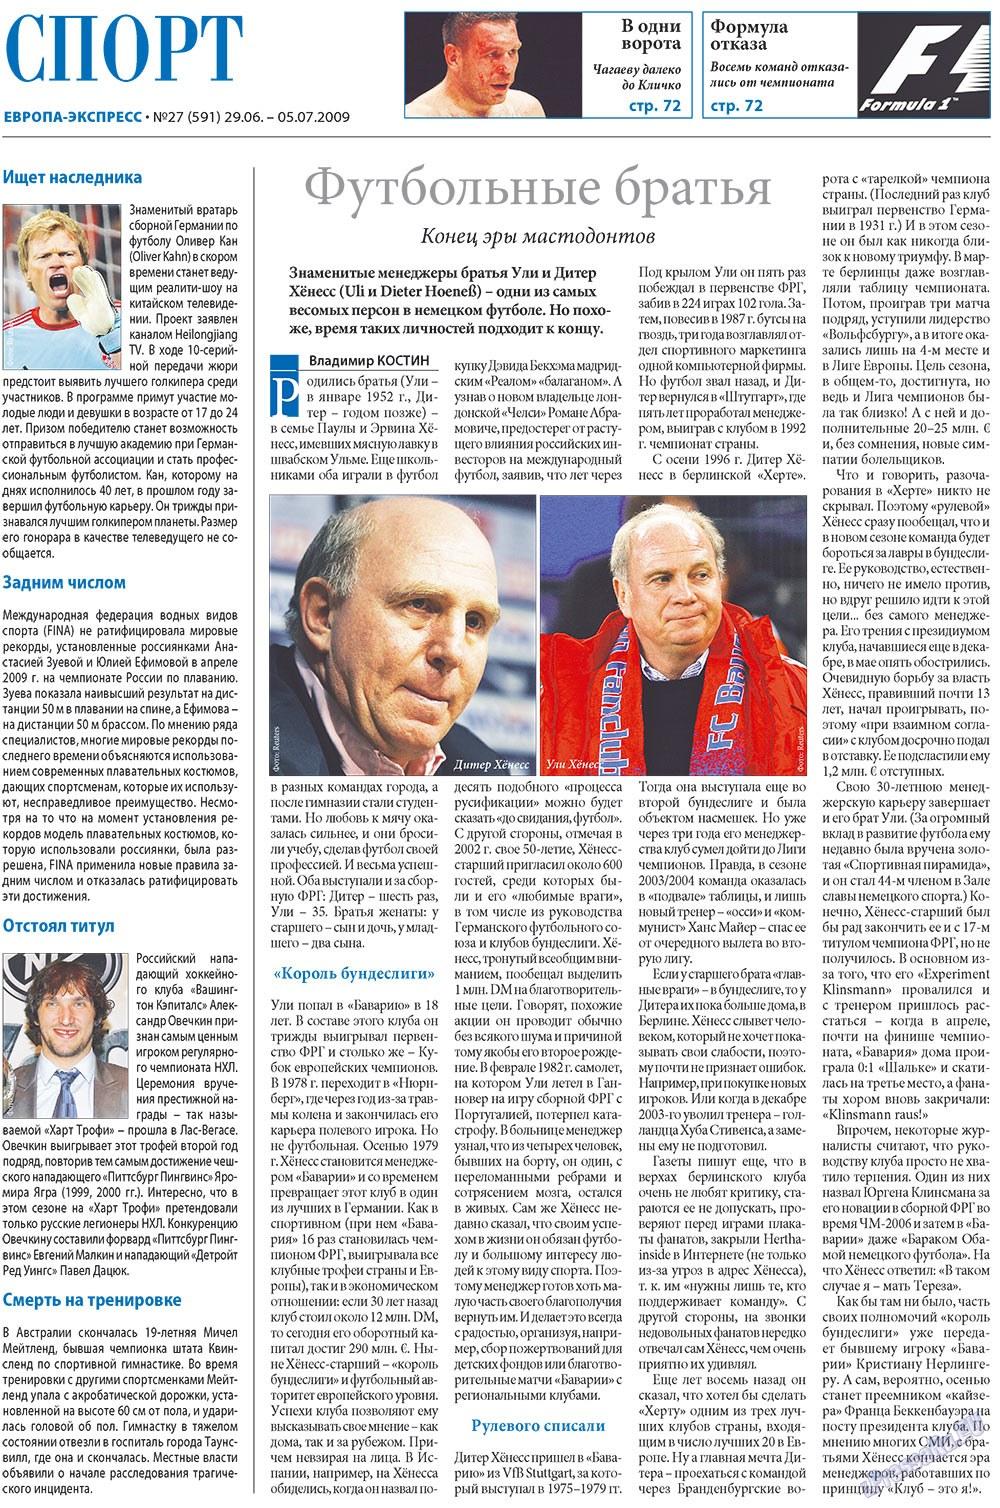 Европа экспресс (газета). 2009 год, номер 27, стр. 23